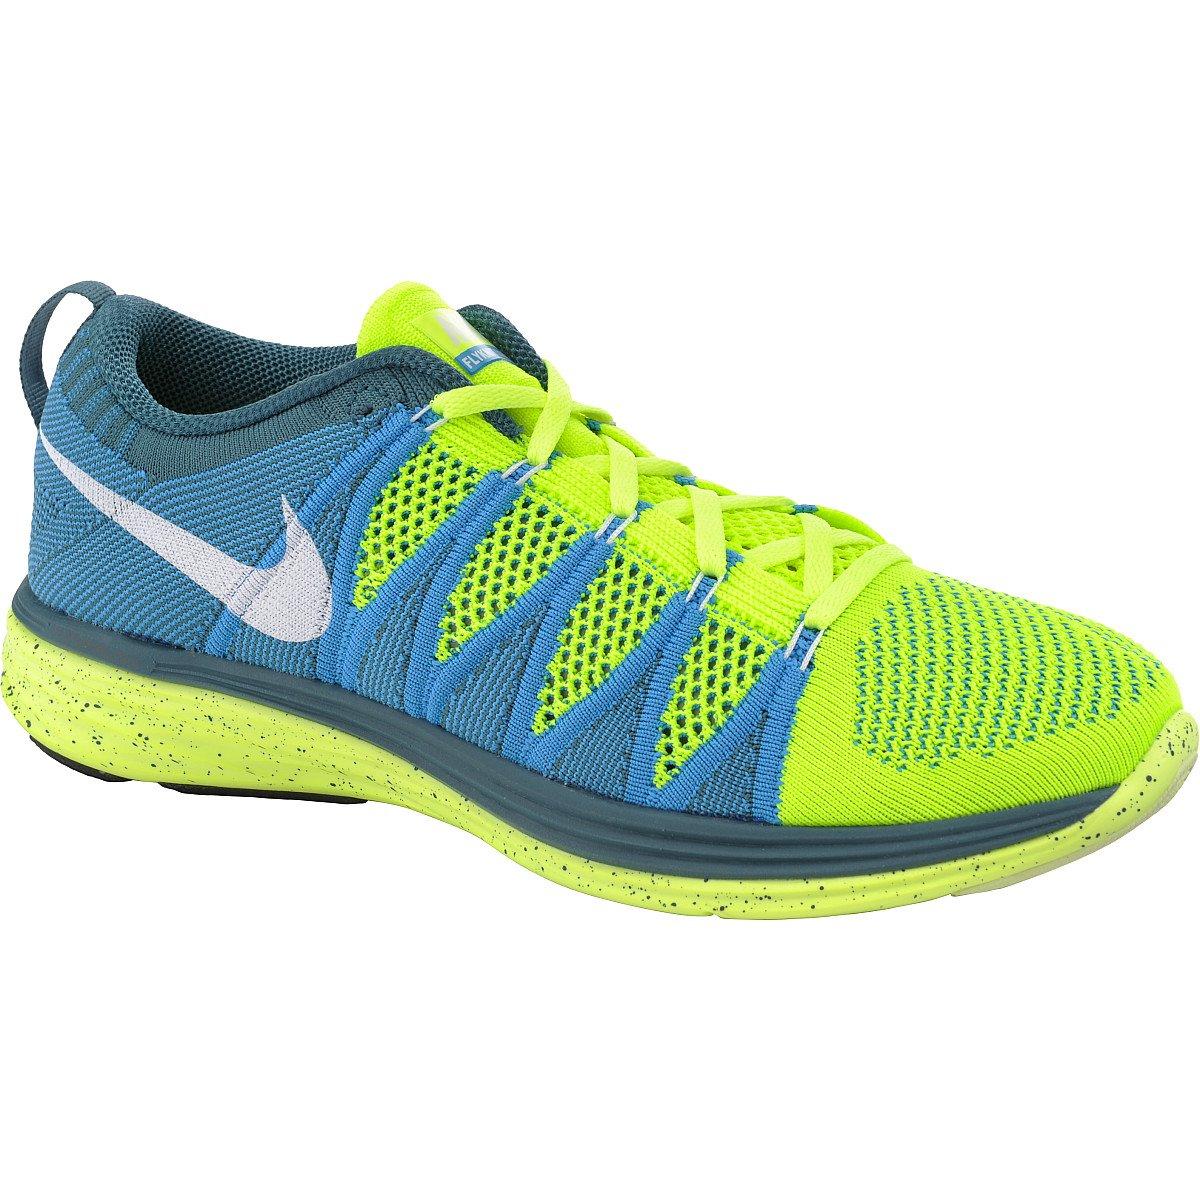 8422232e52 Galleon - Nike Flyknit Lunar2 Mens Running Shoes 620465-714 Volt 7 M US